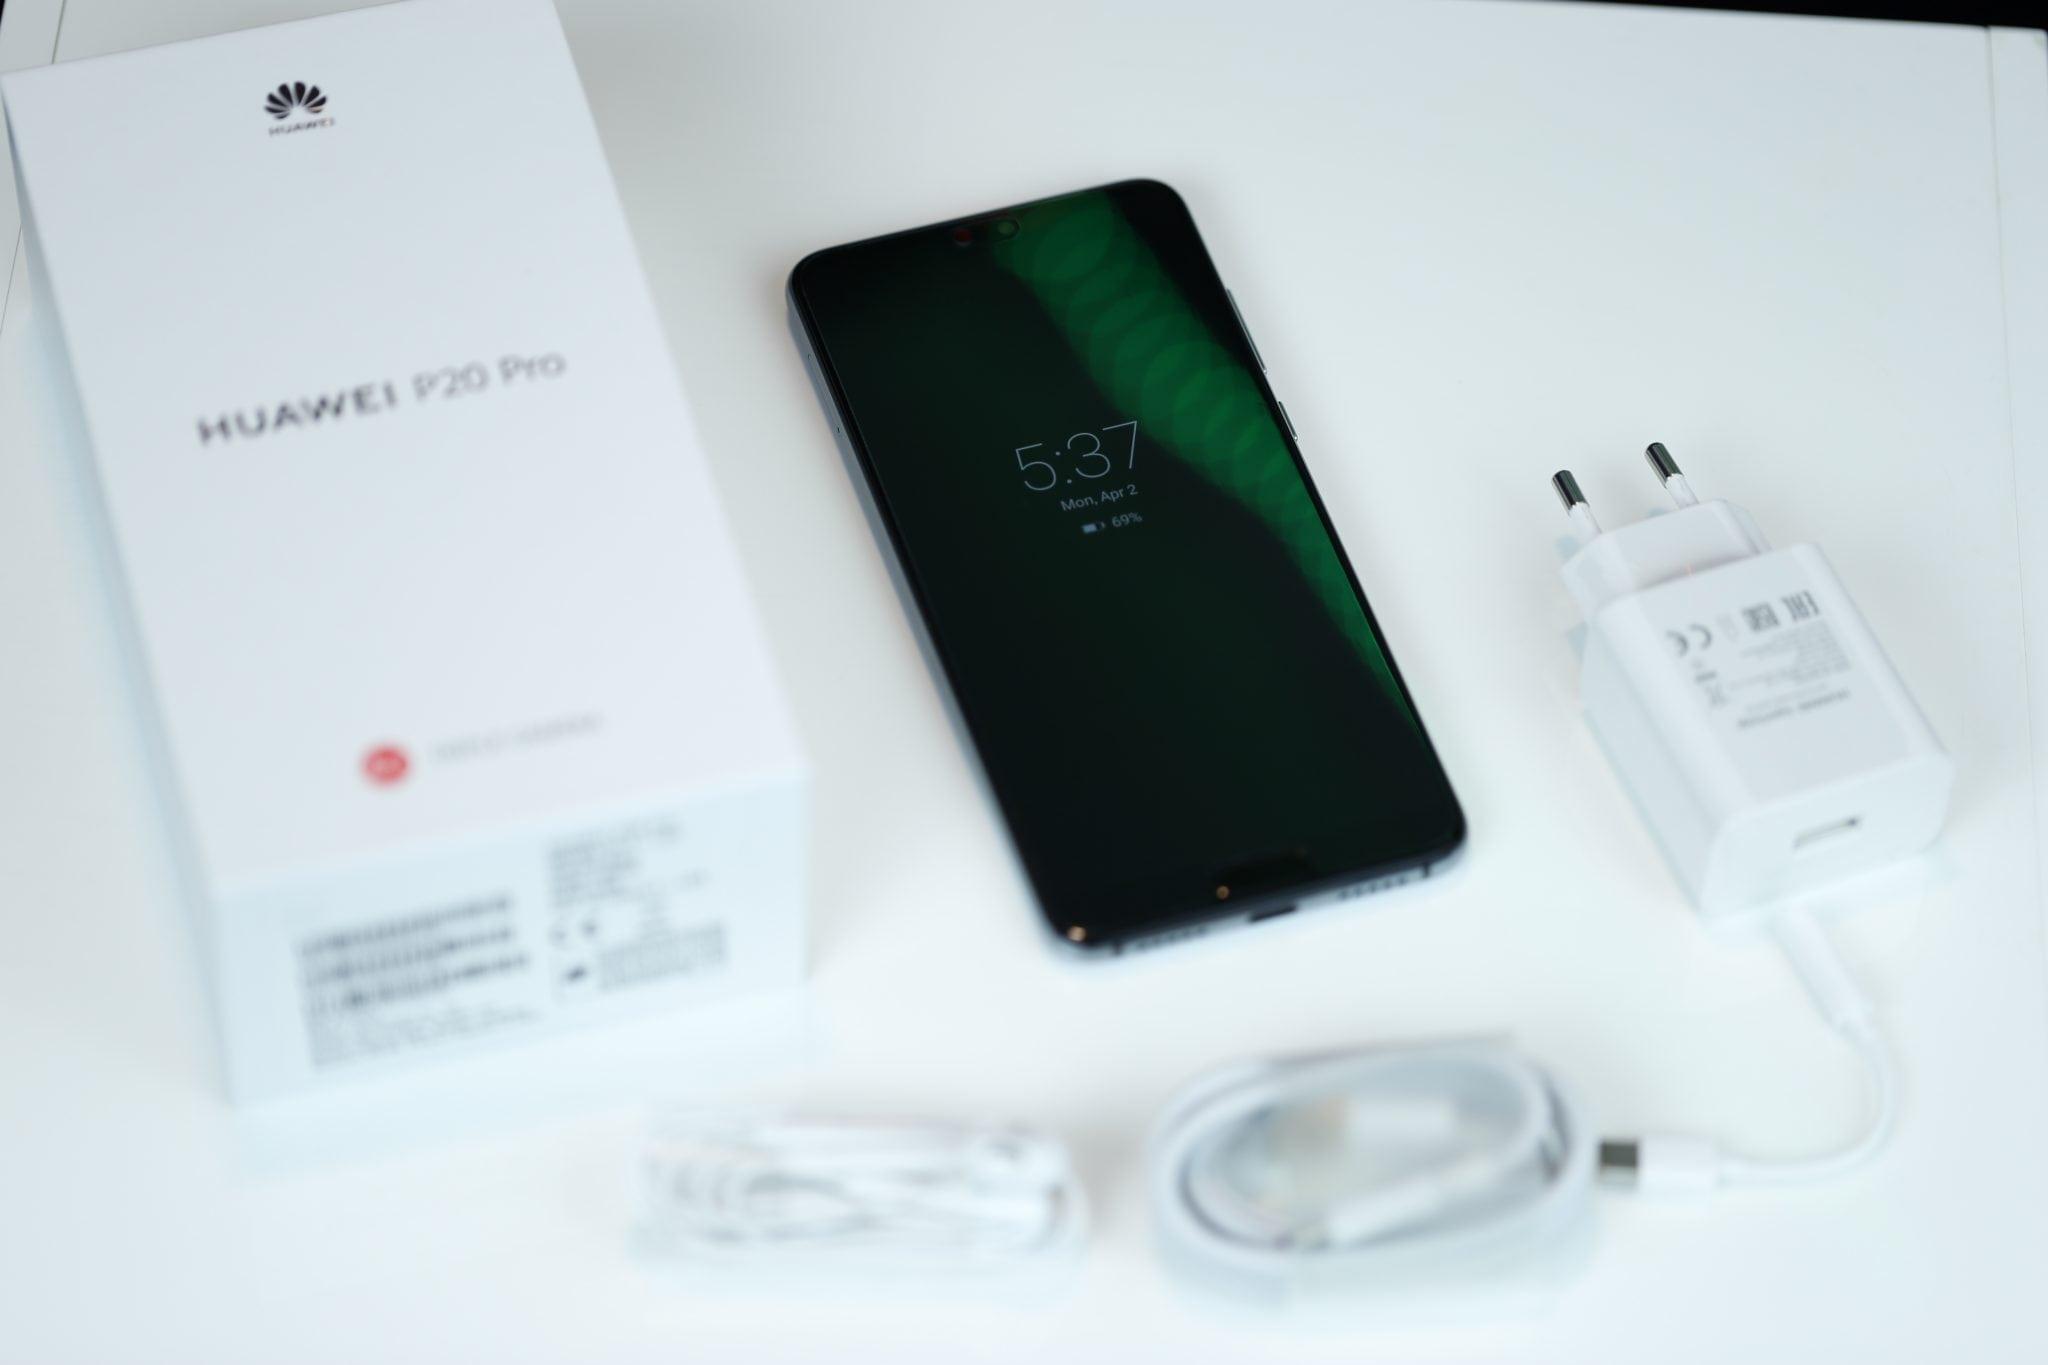 Huawei P20 Pro Always On Display